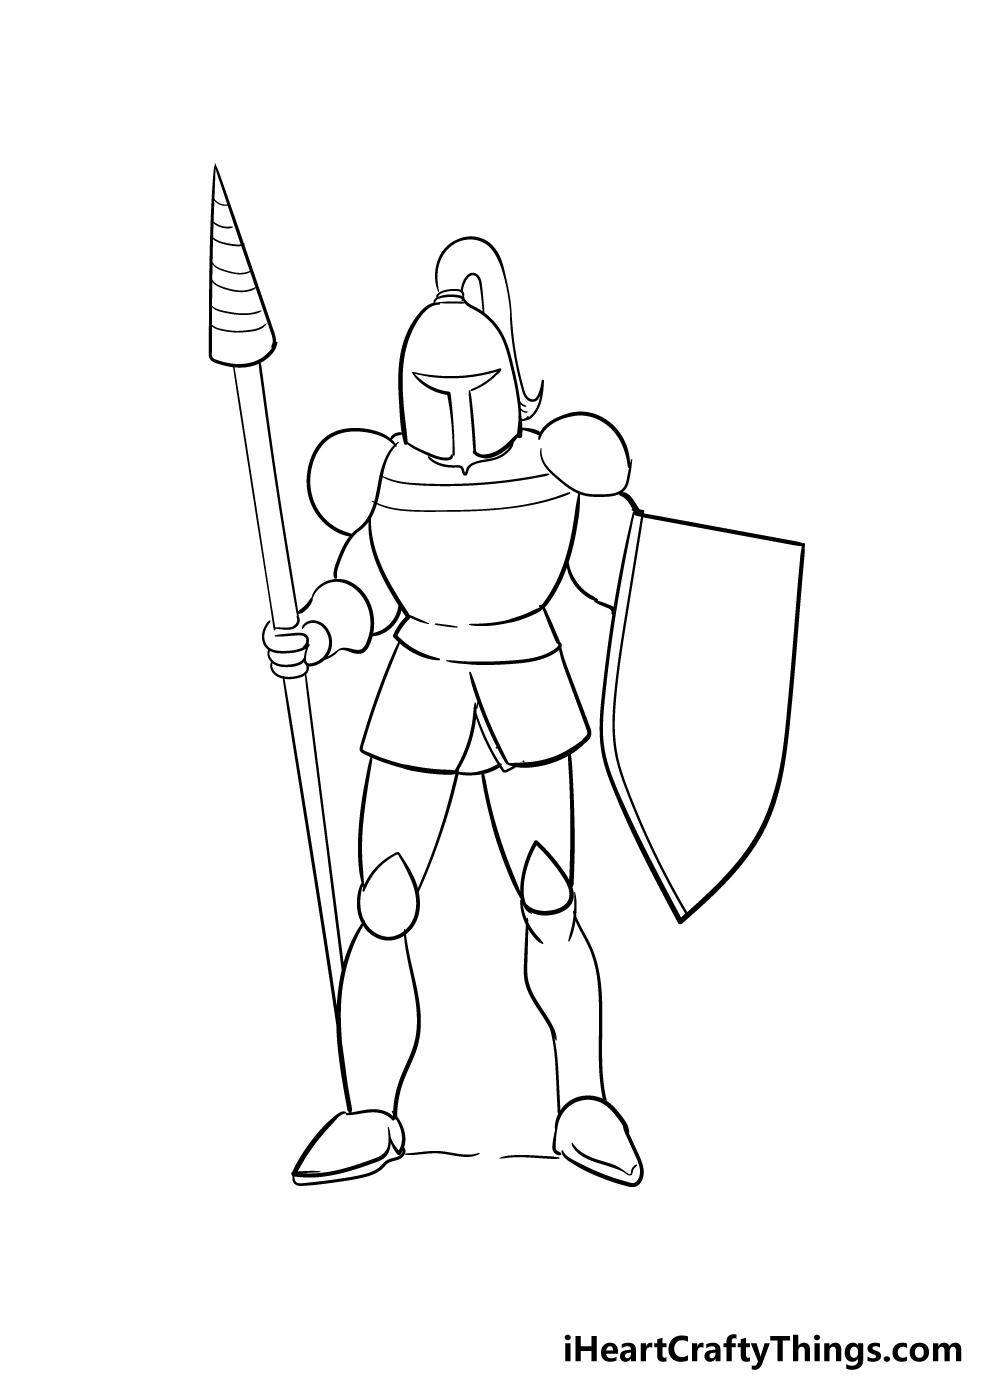 knight drawing step 6